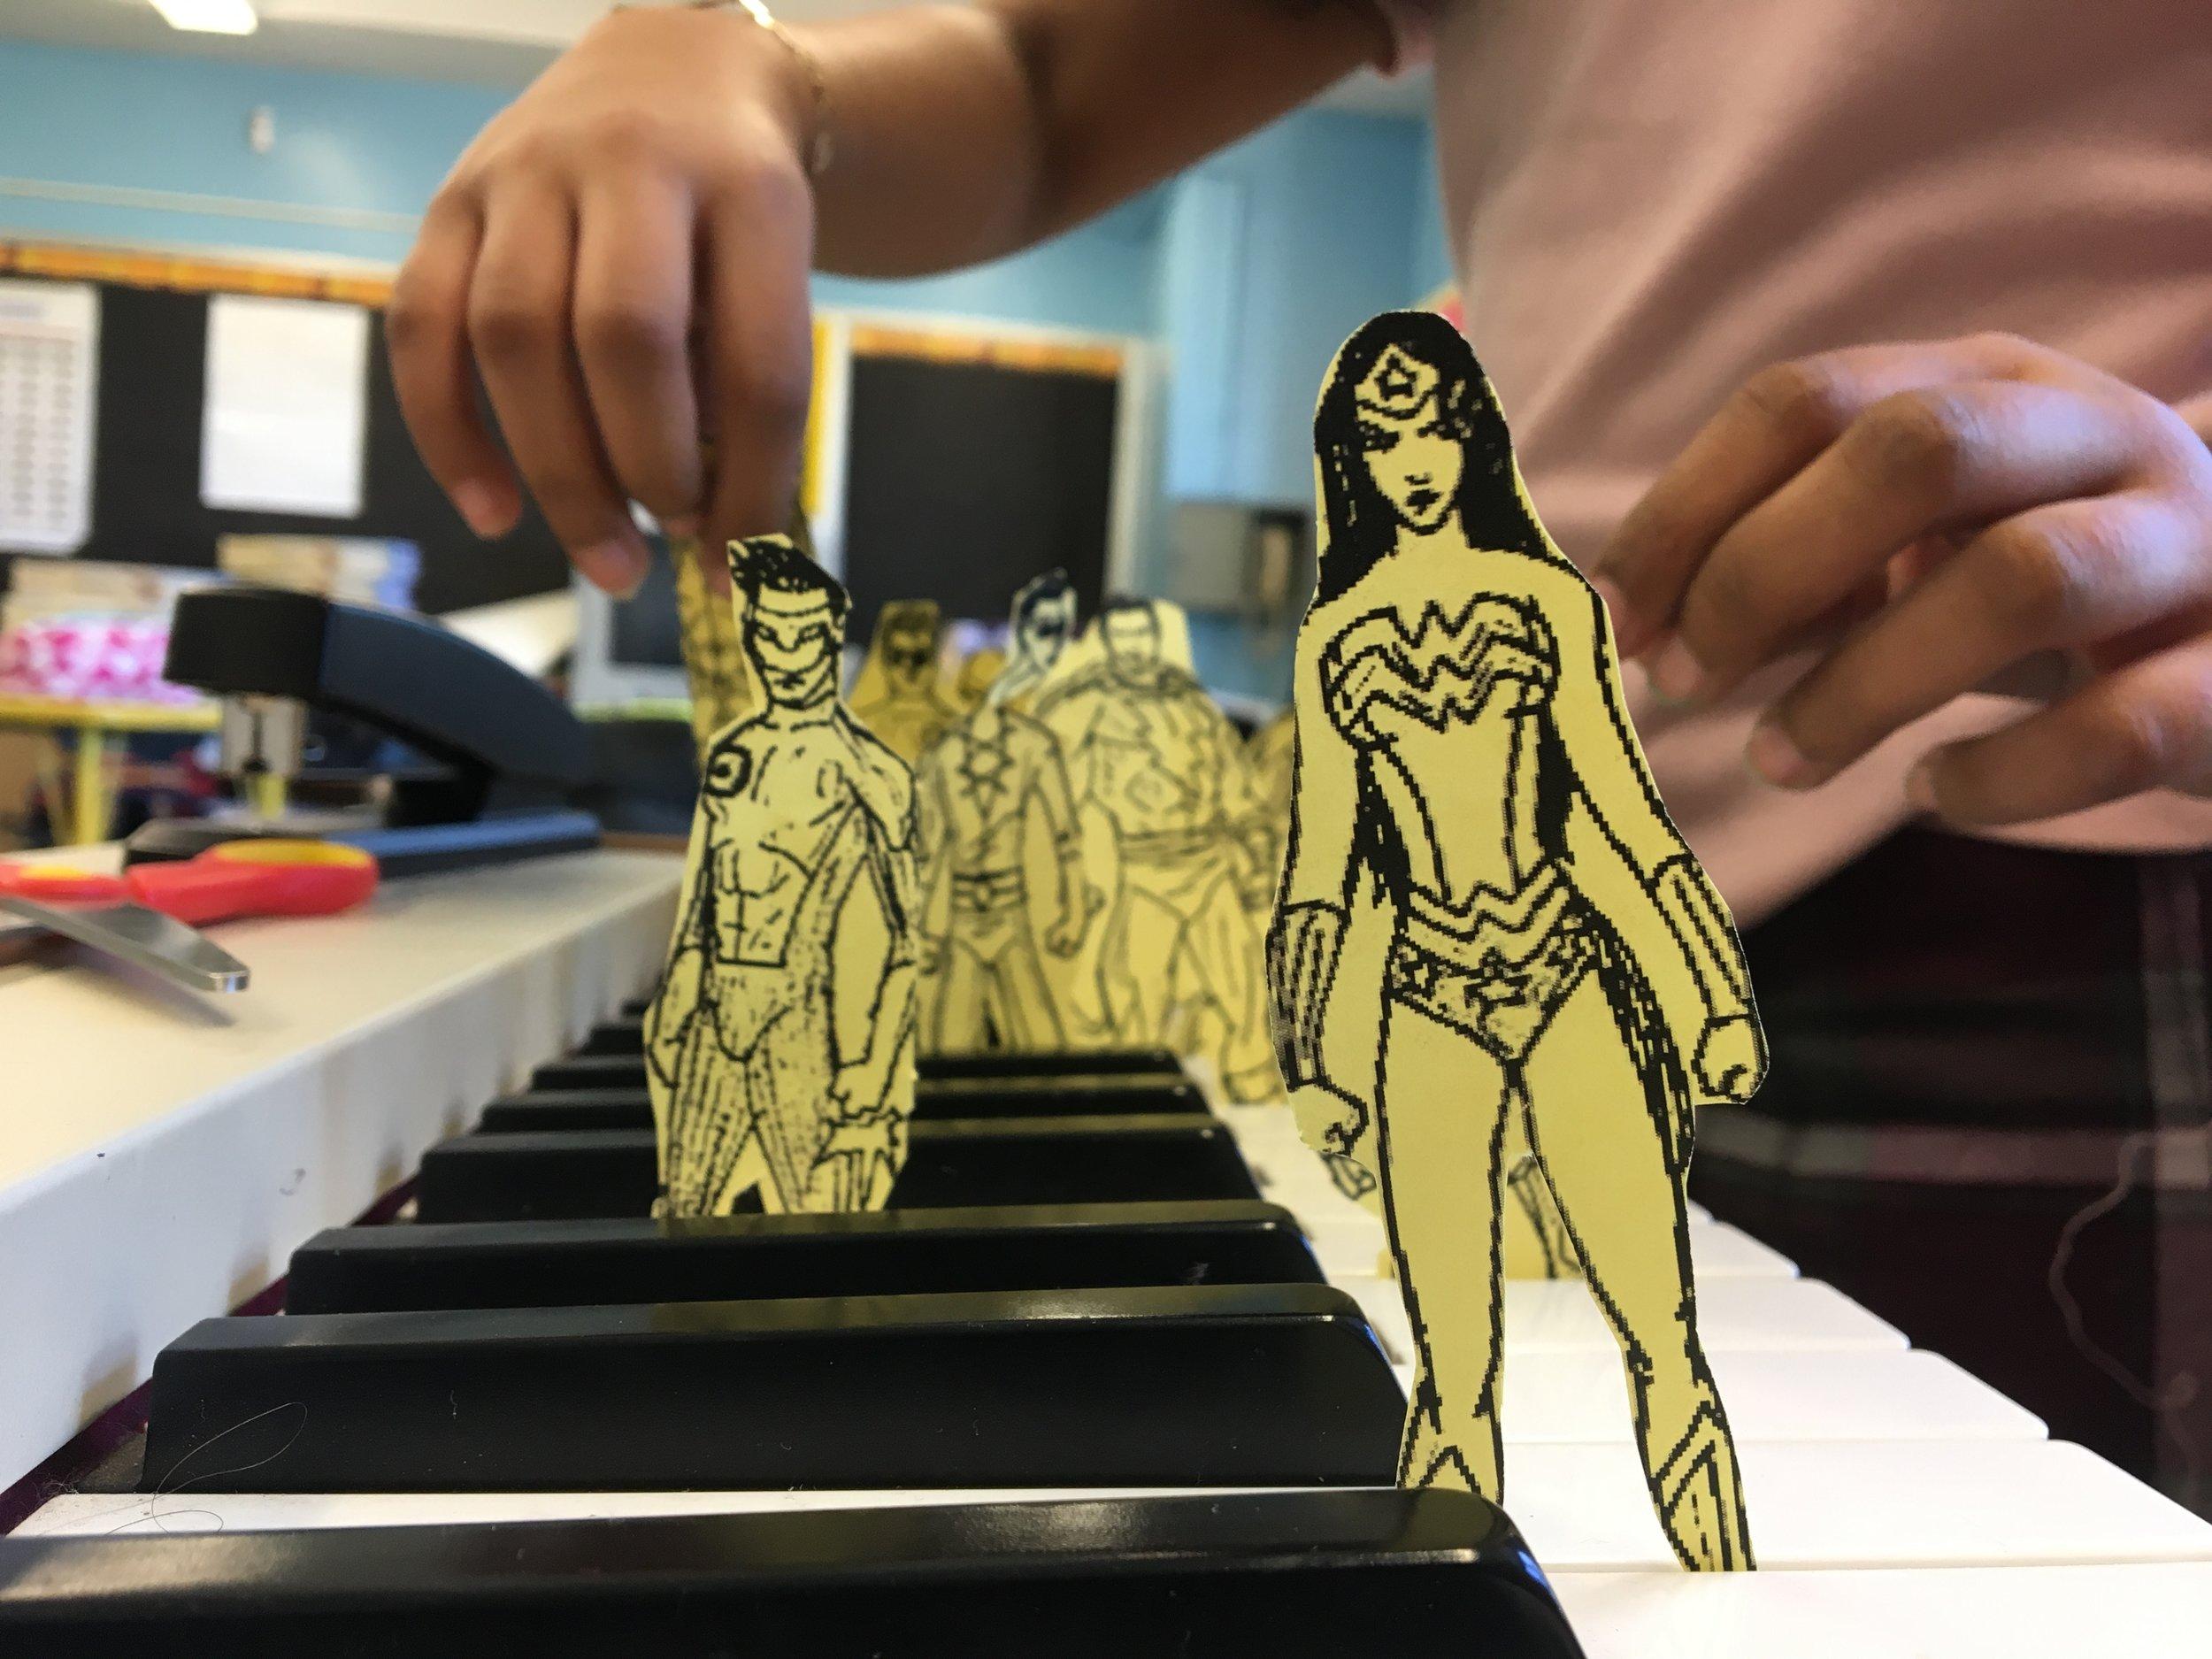 superhero songs with cartoon